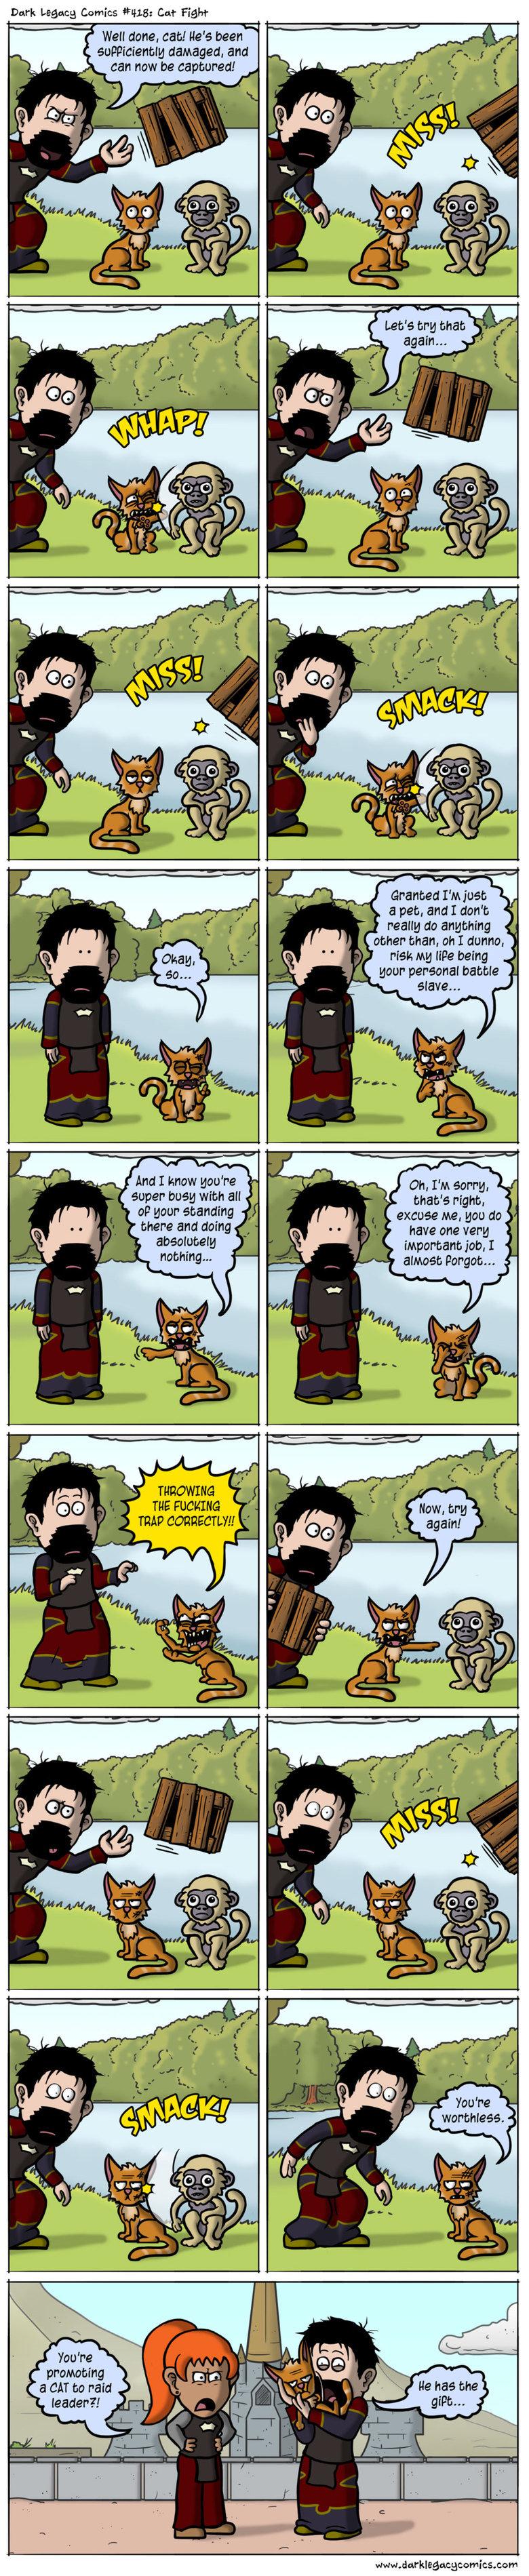 wow pet battles. source: darklegacycomics.com.